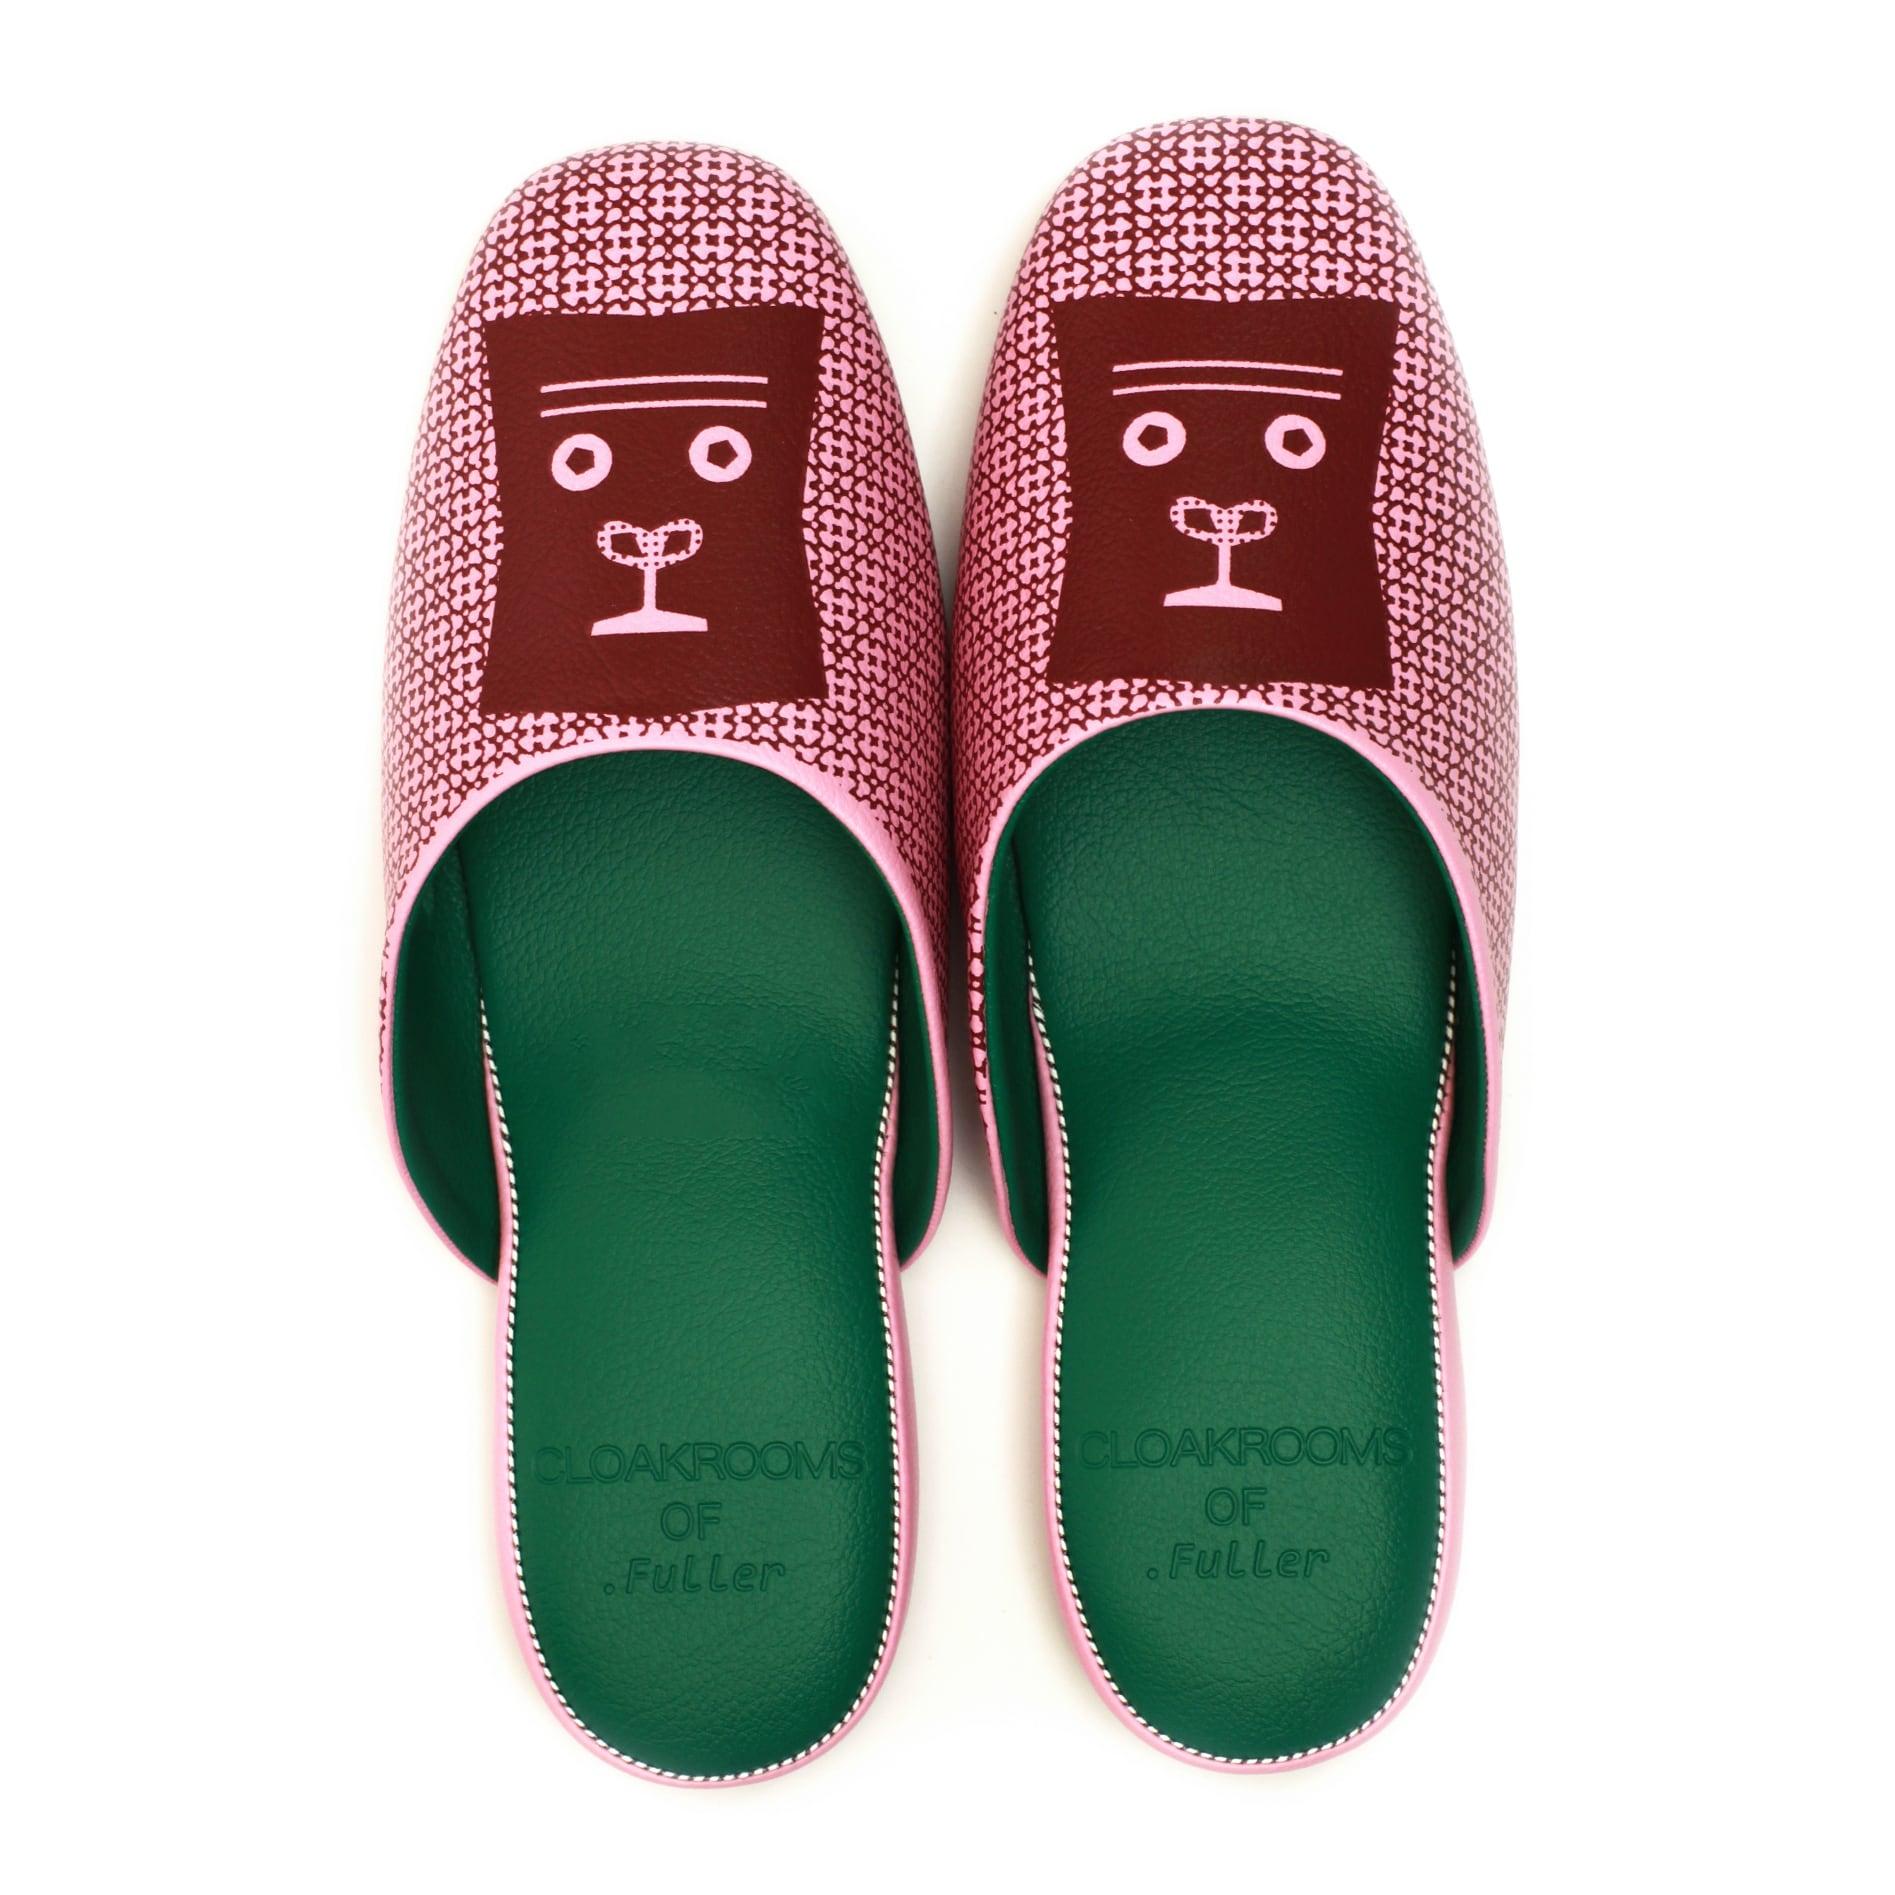 CLOAKROOMS of .Fuller  PANTOUFLE クロークルームス スリッパ 【tupera tupera×ふたごのゴリラ】 ピンク×グリーン